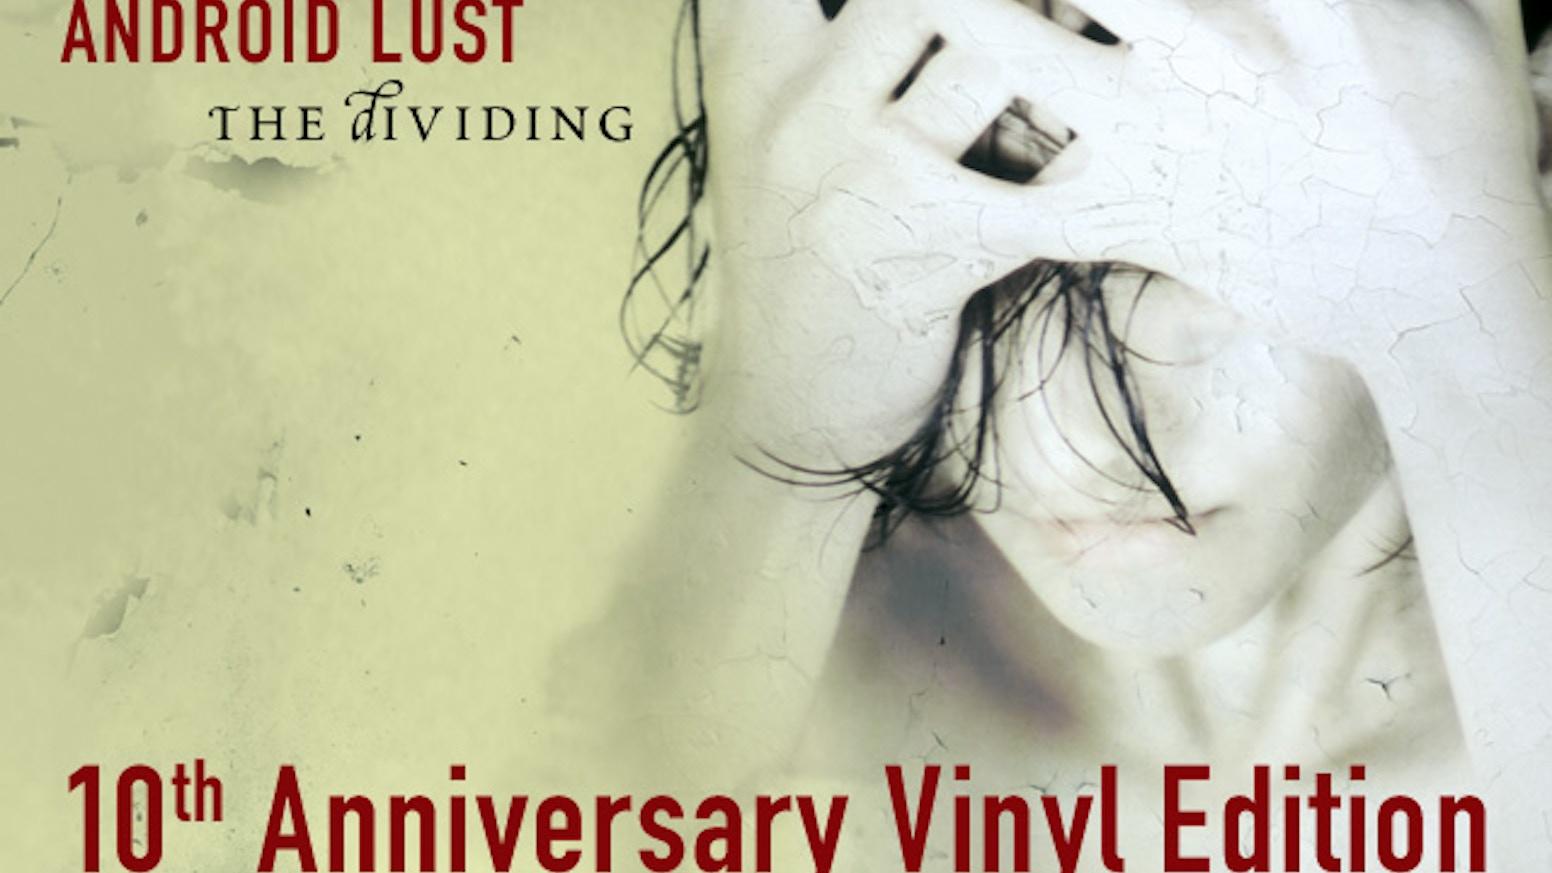 Ten year anniversary edition double vinyl release with bonus tracks.